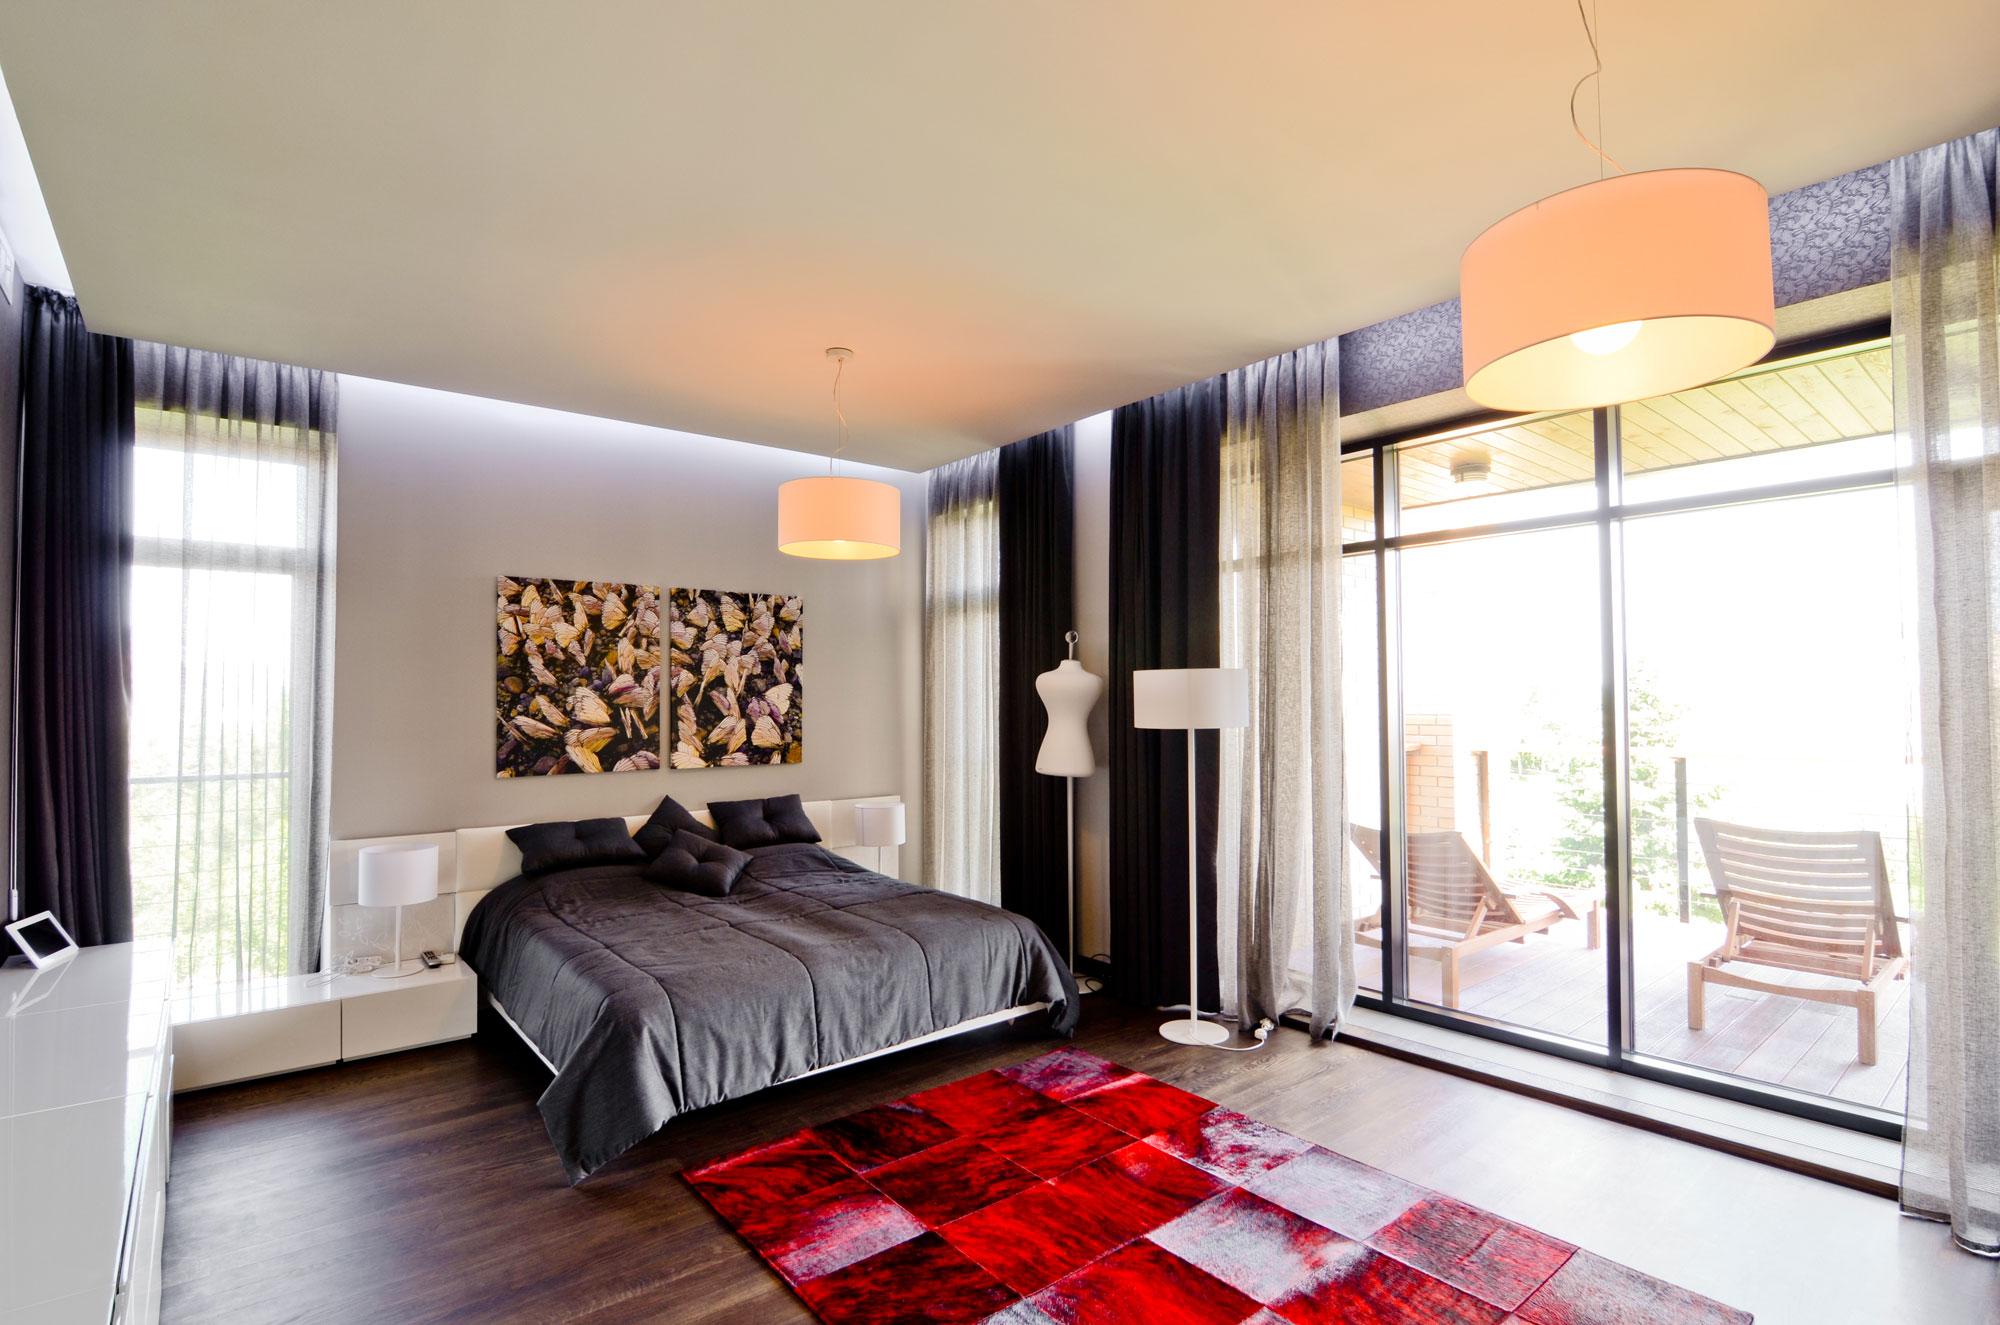 Kiev-residence-22 - nimvo - interior design & luxury homes.